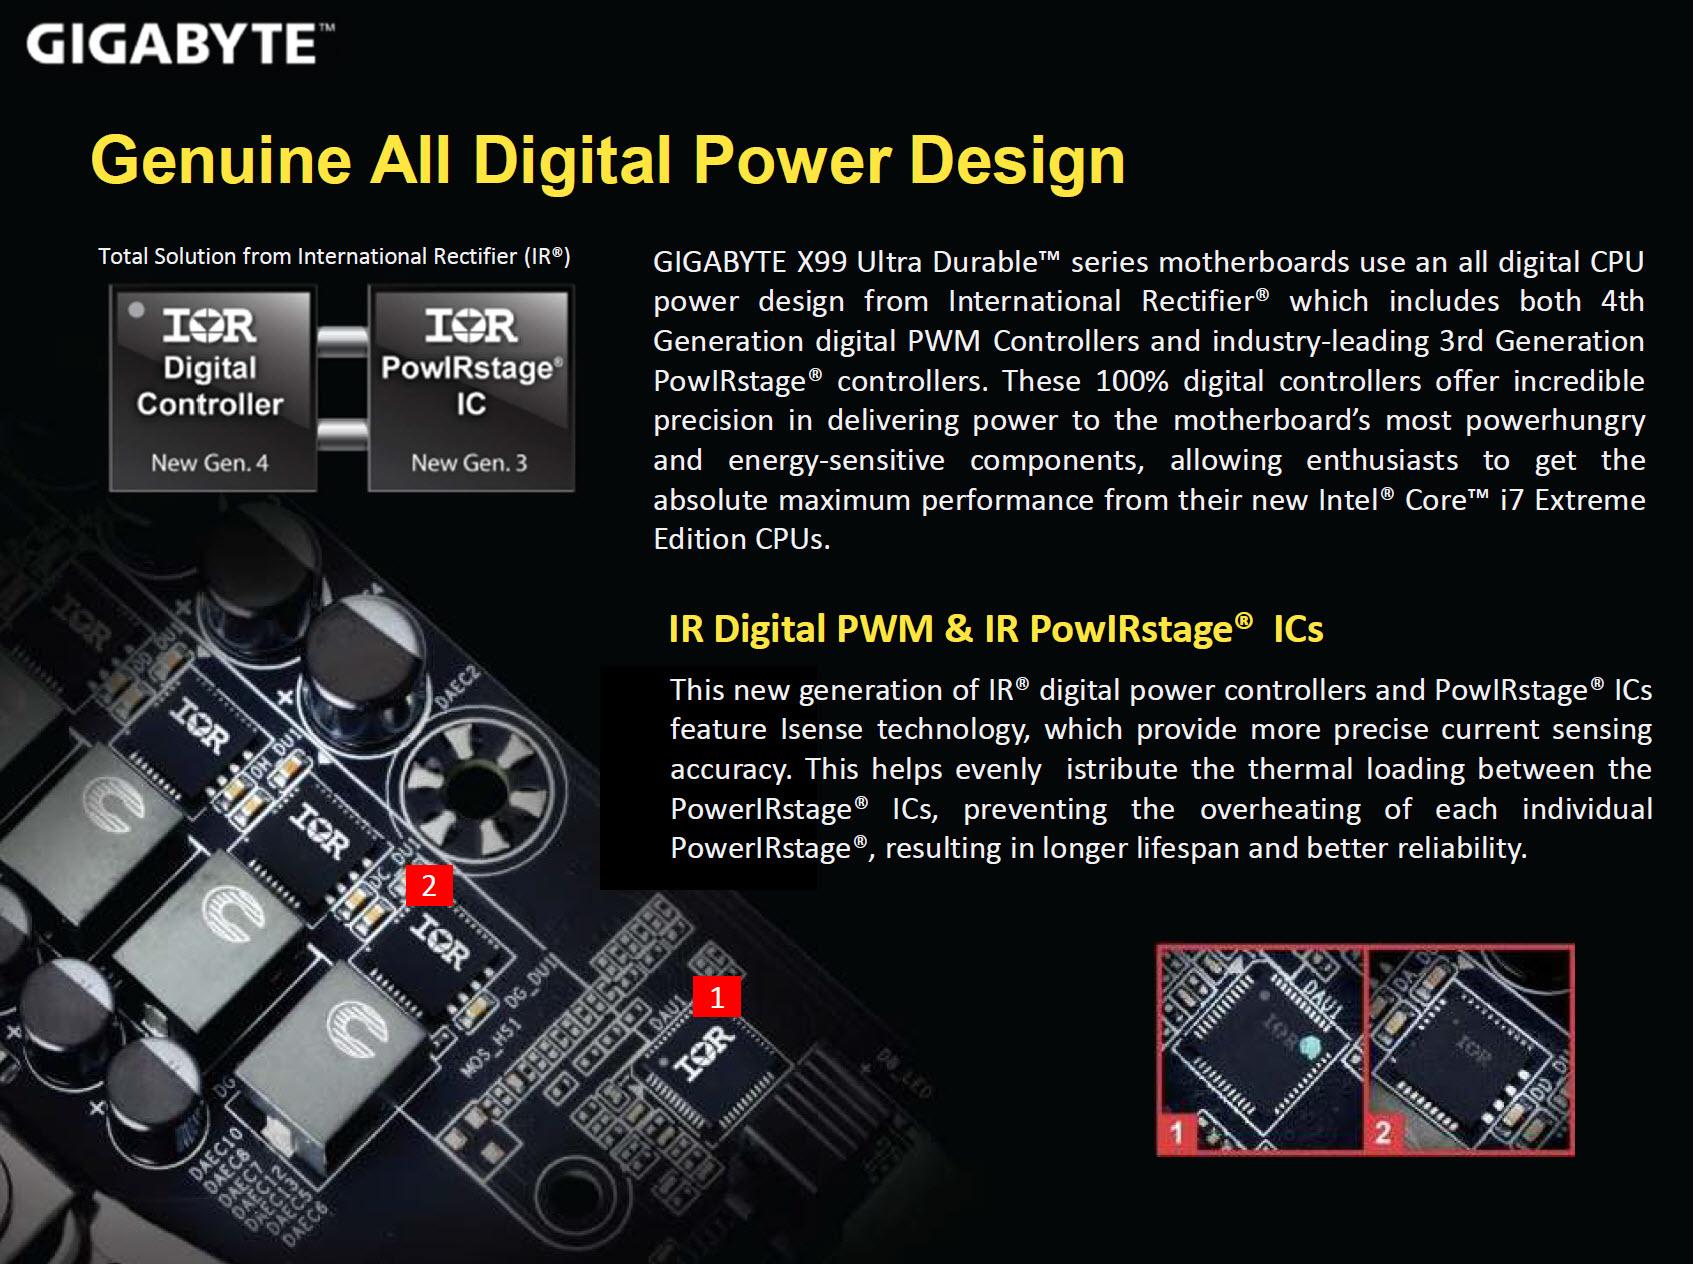 gigabyte-x99-ud7-wifi_all-power-design